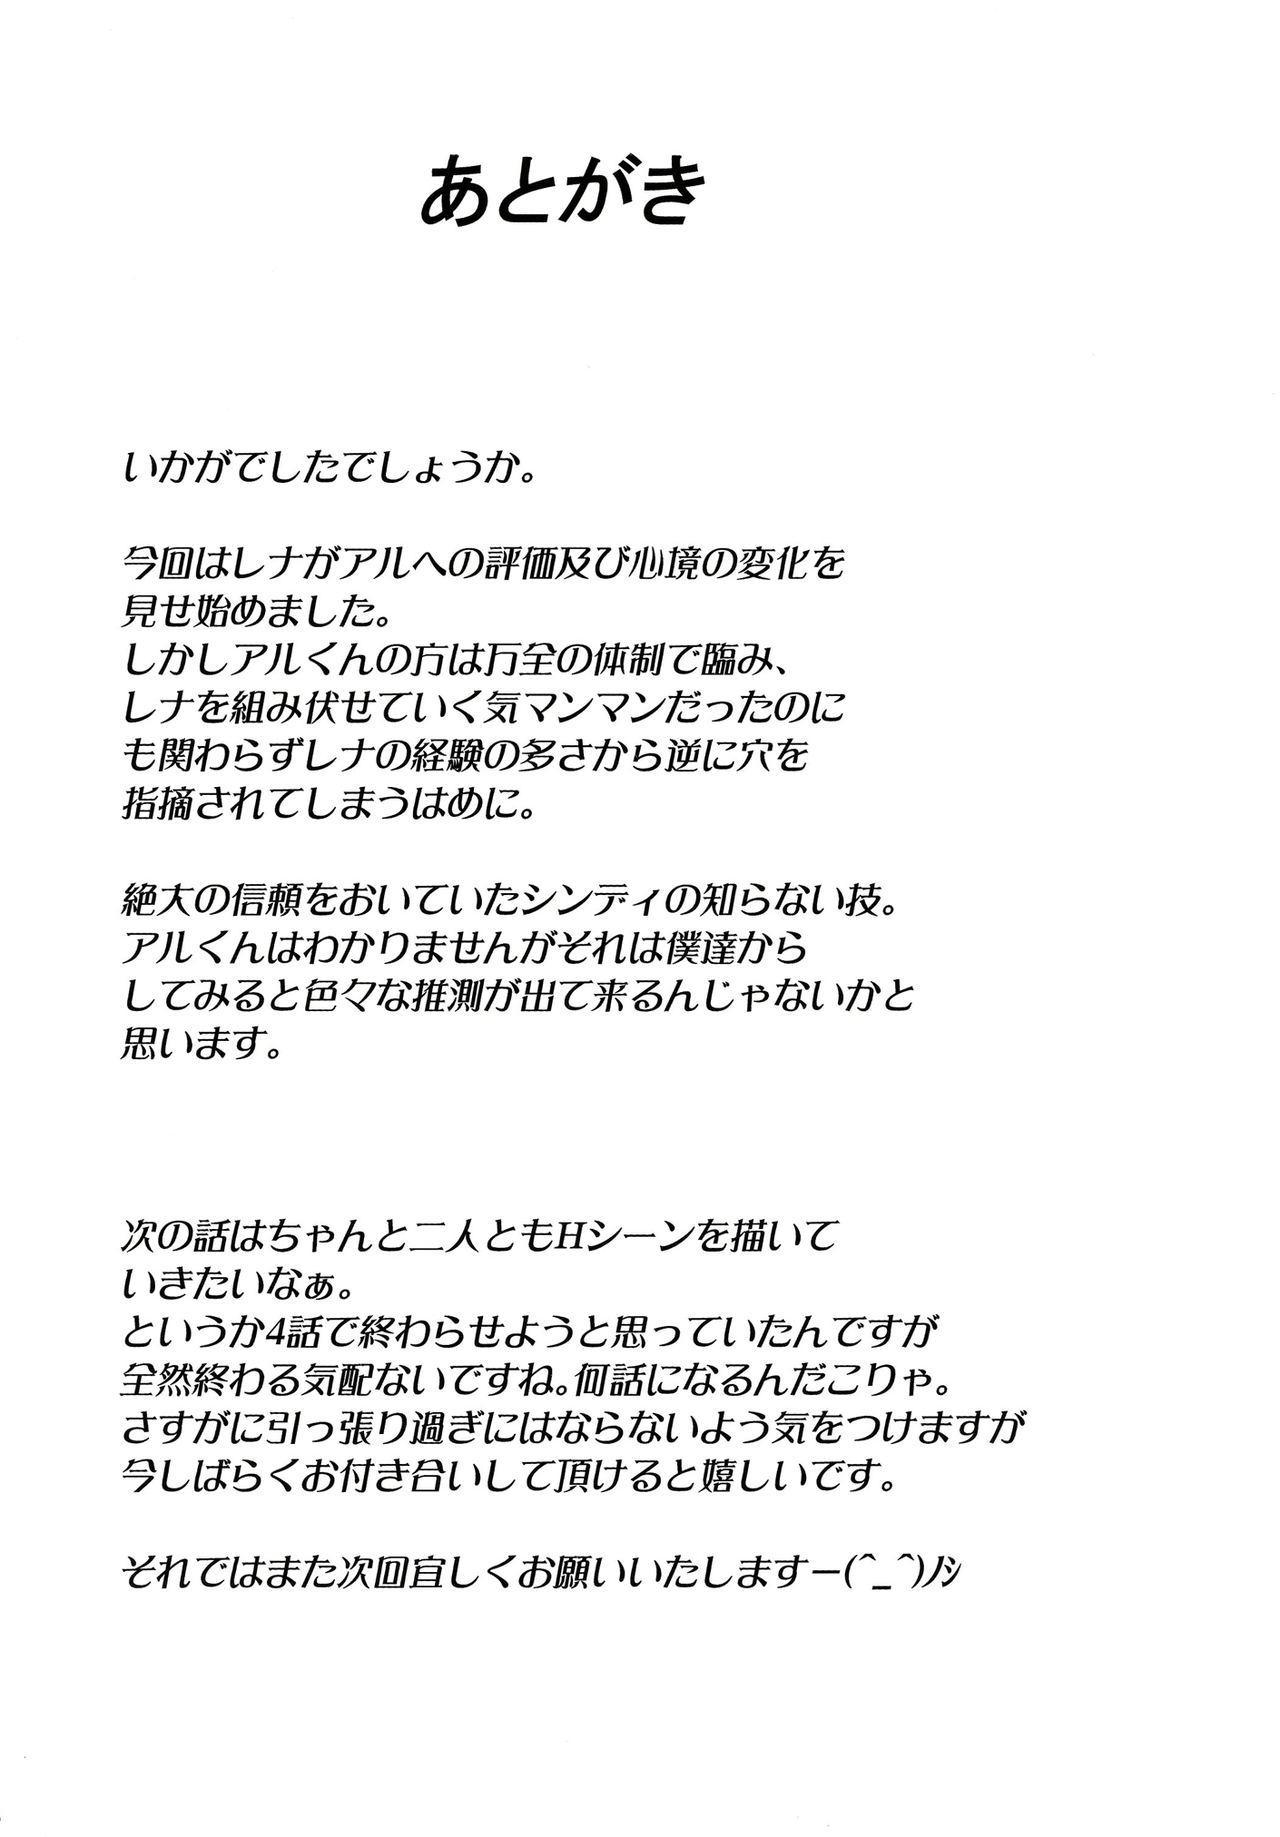 Gal Shota Cinderella 3 31